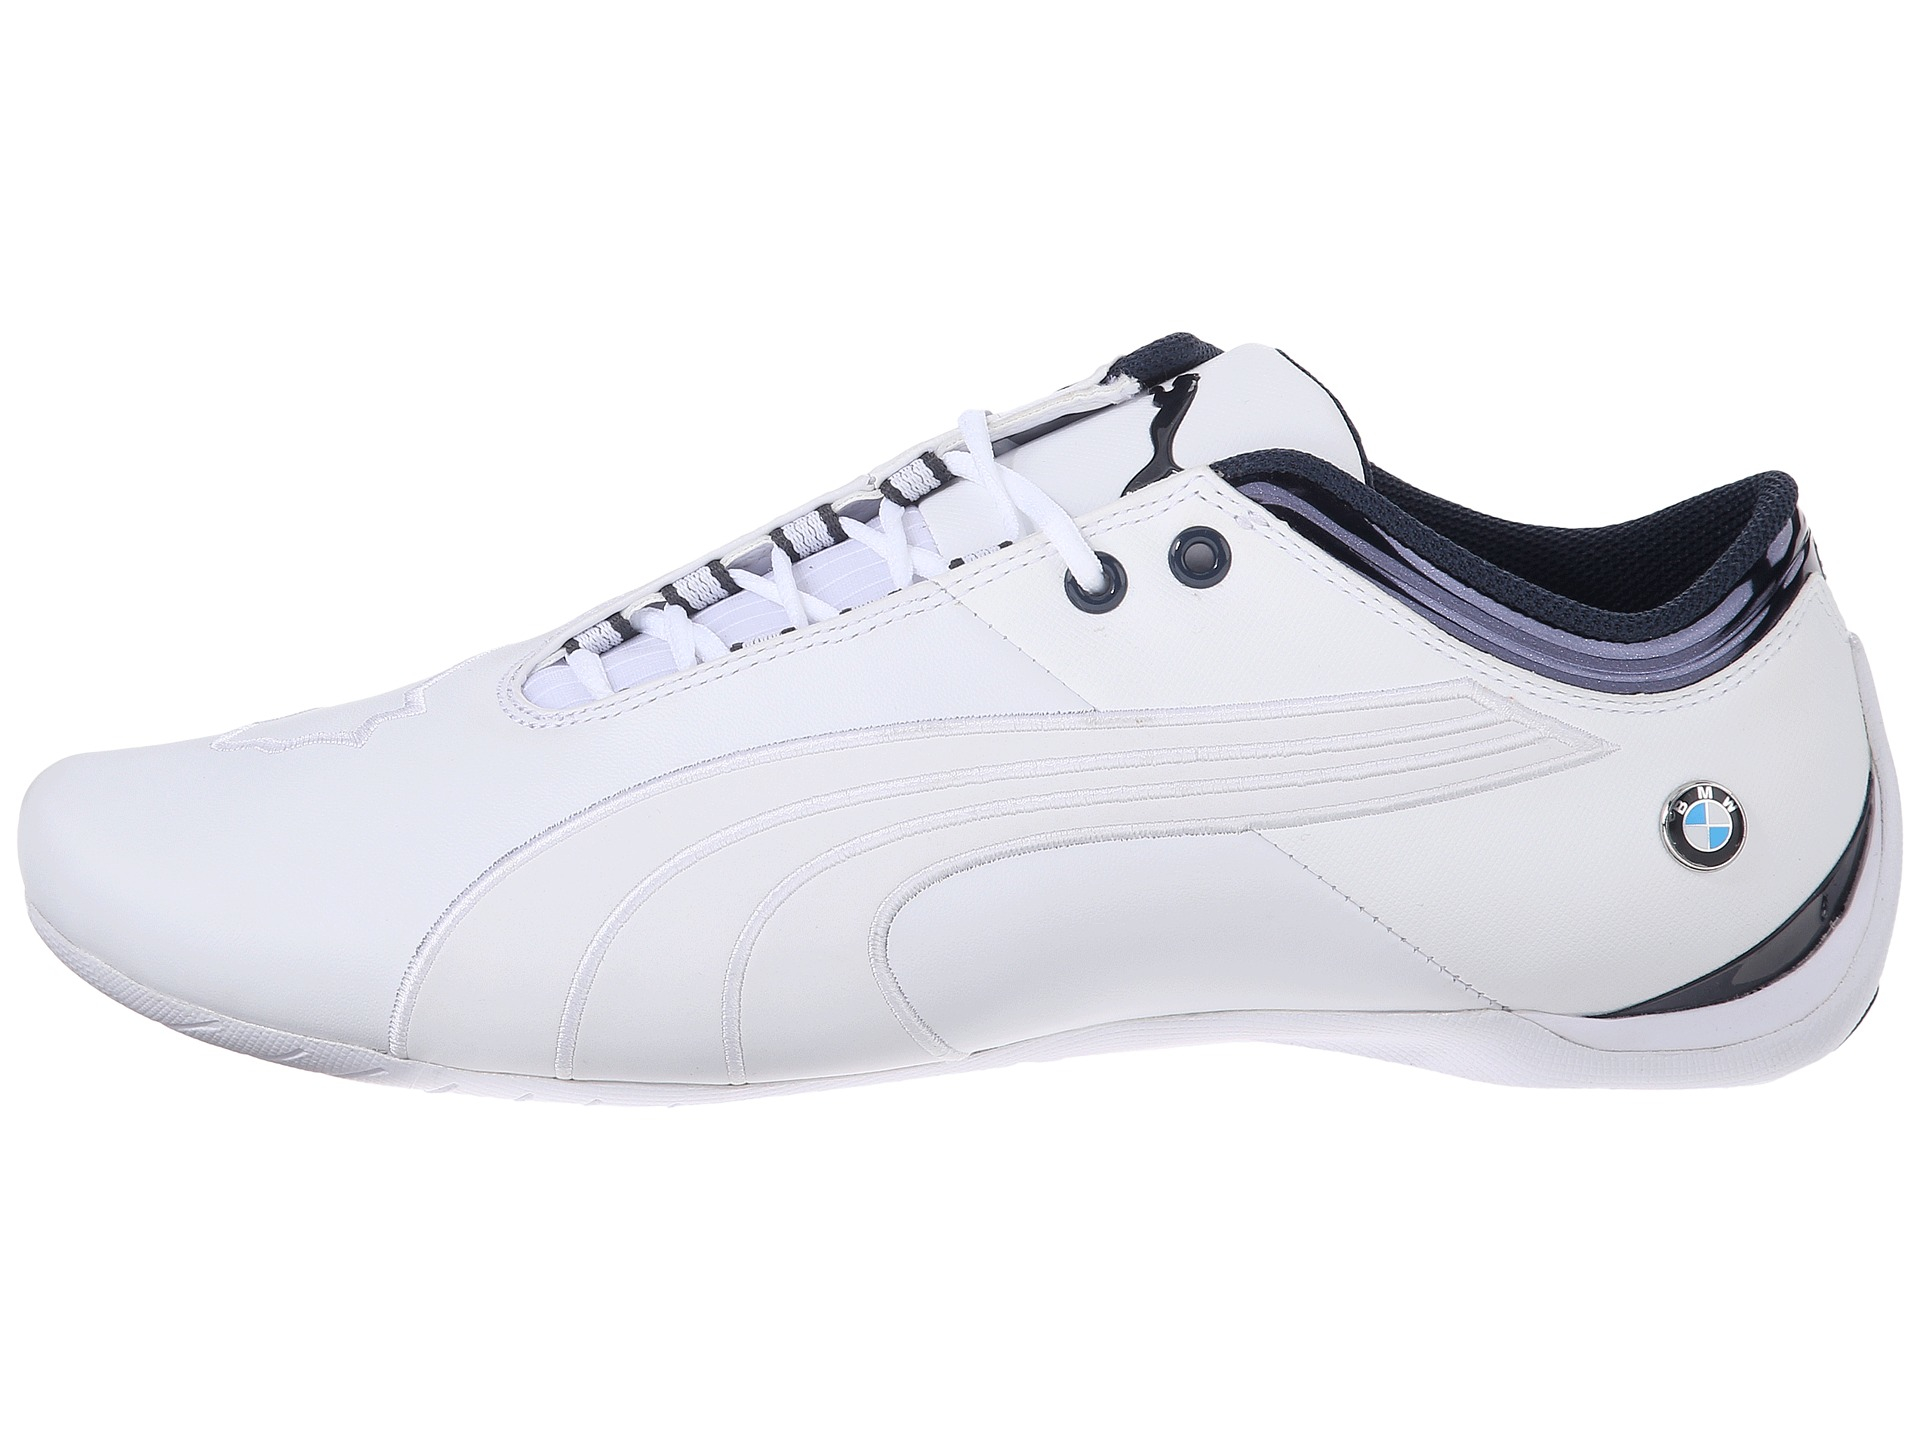 afe3aec7e691c8 White Cat Men Puma M1 For 2 Bmw Lyst Ms Future In xHIwOvq8